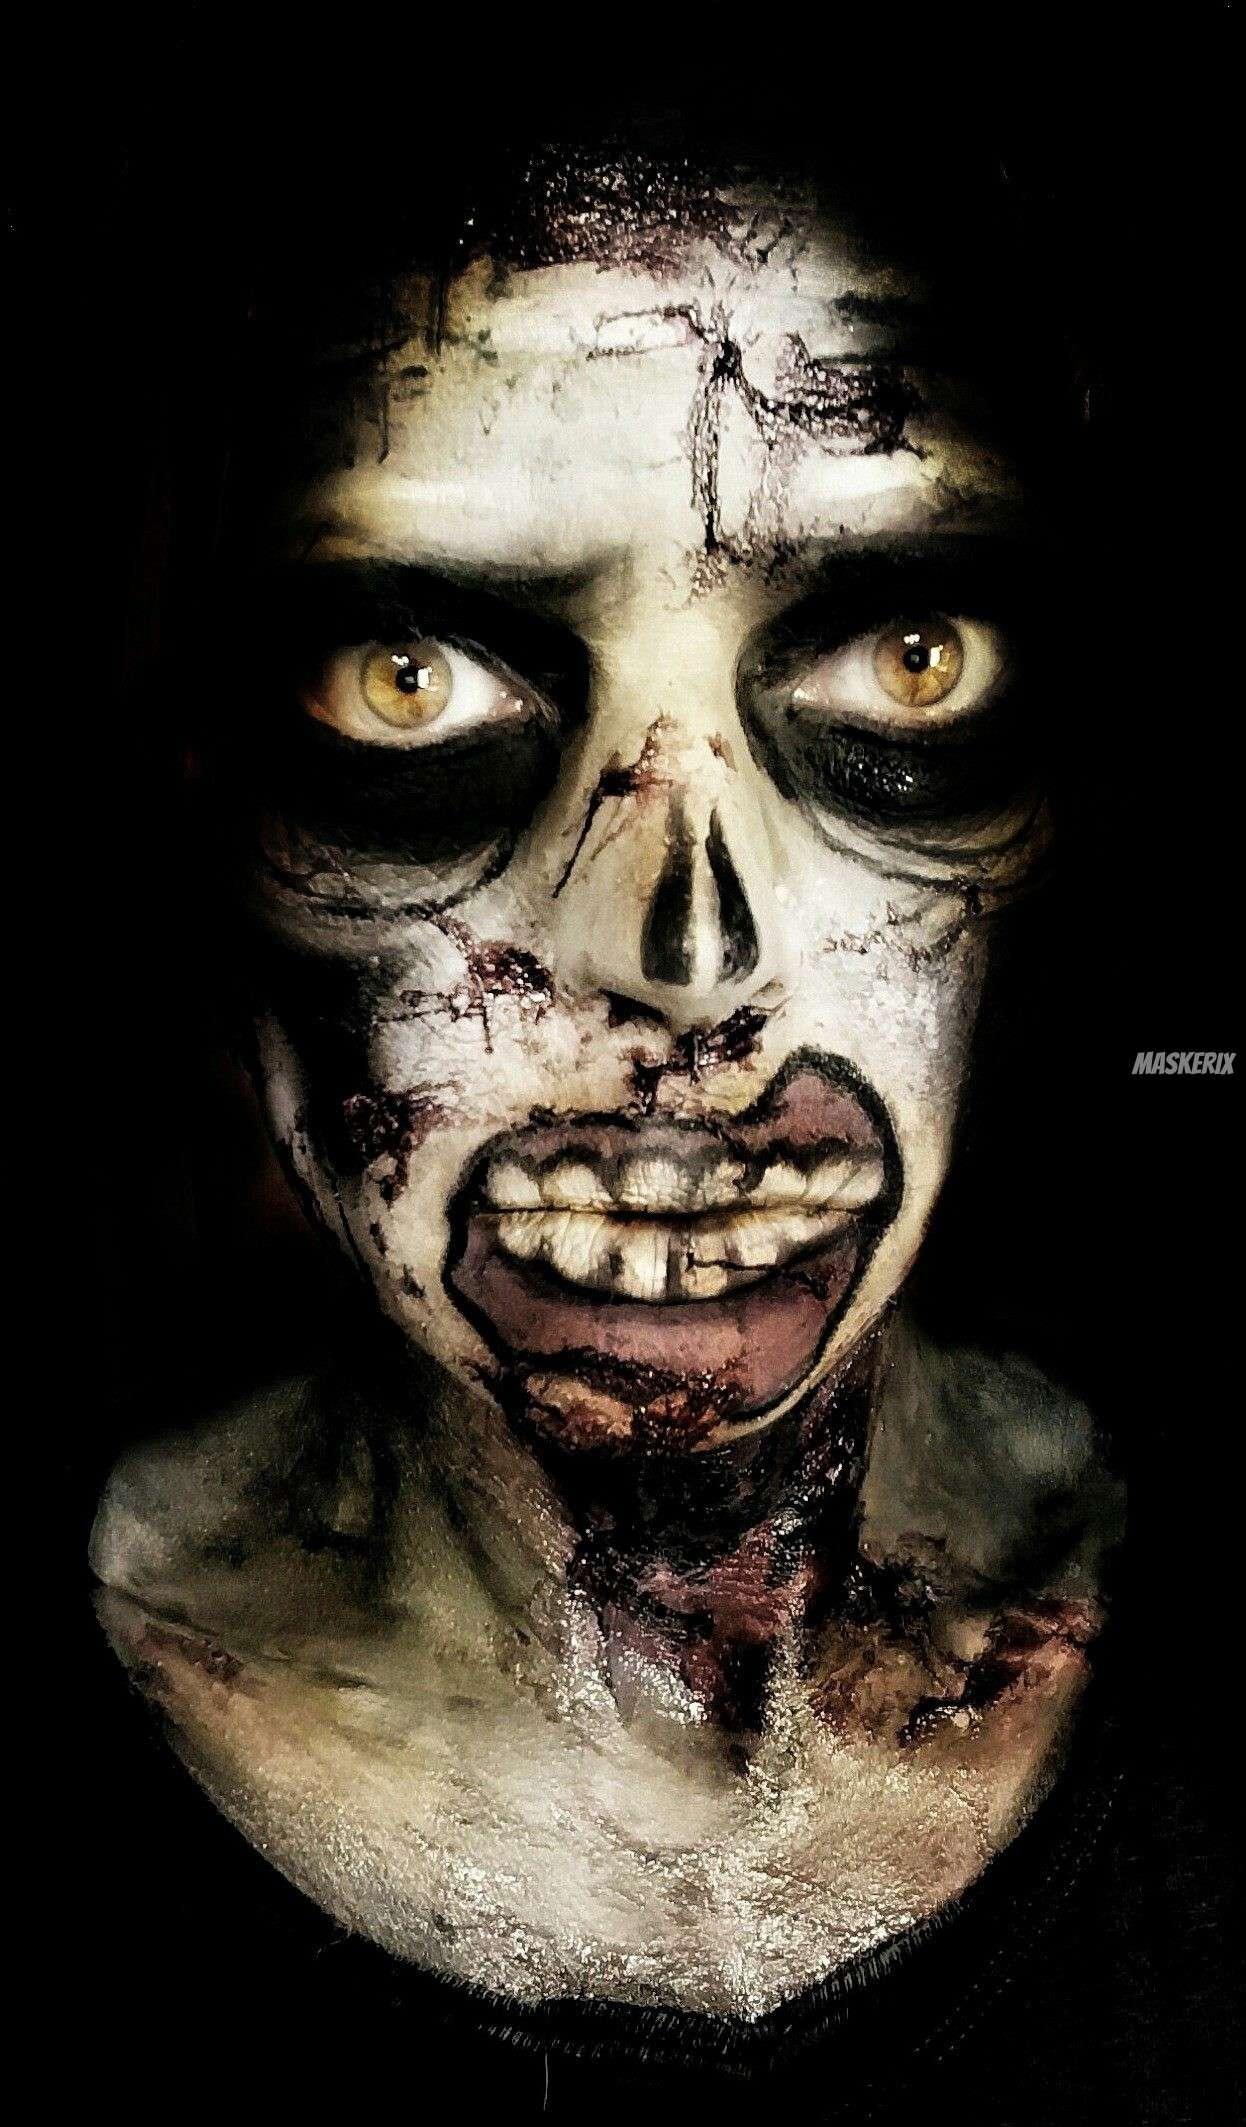 Zombie Kostum Selber Machen Ideen Diy Anleitung Maskerix De